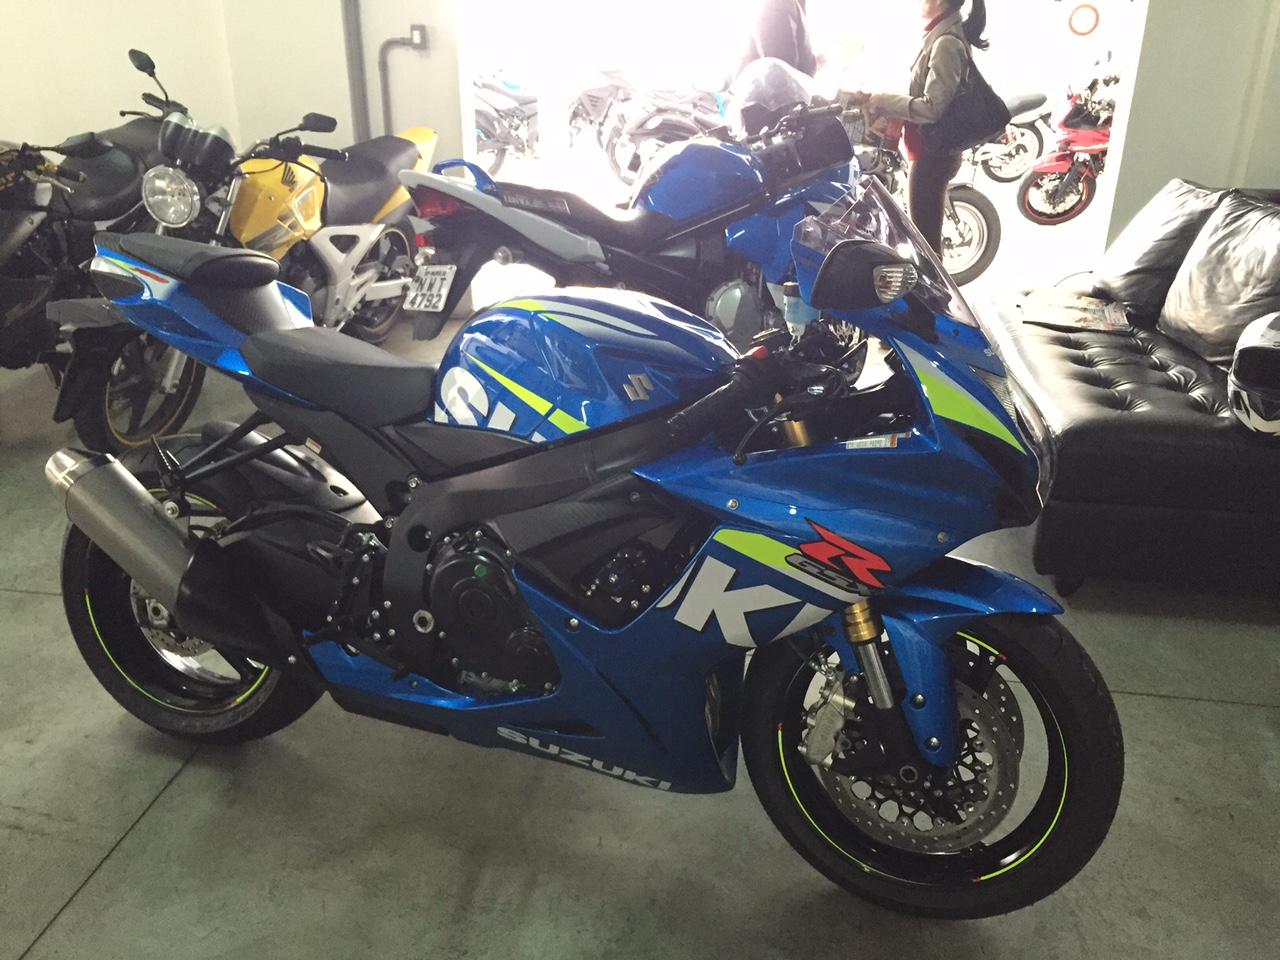 Falae Galera!!! Mais uma Srad 750 Azul MotoGP na área A31e9bb44af908e95fe3eafa24b547dd16fa6a82